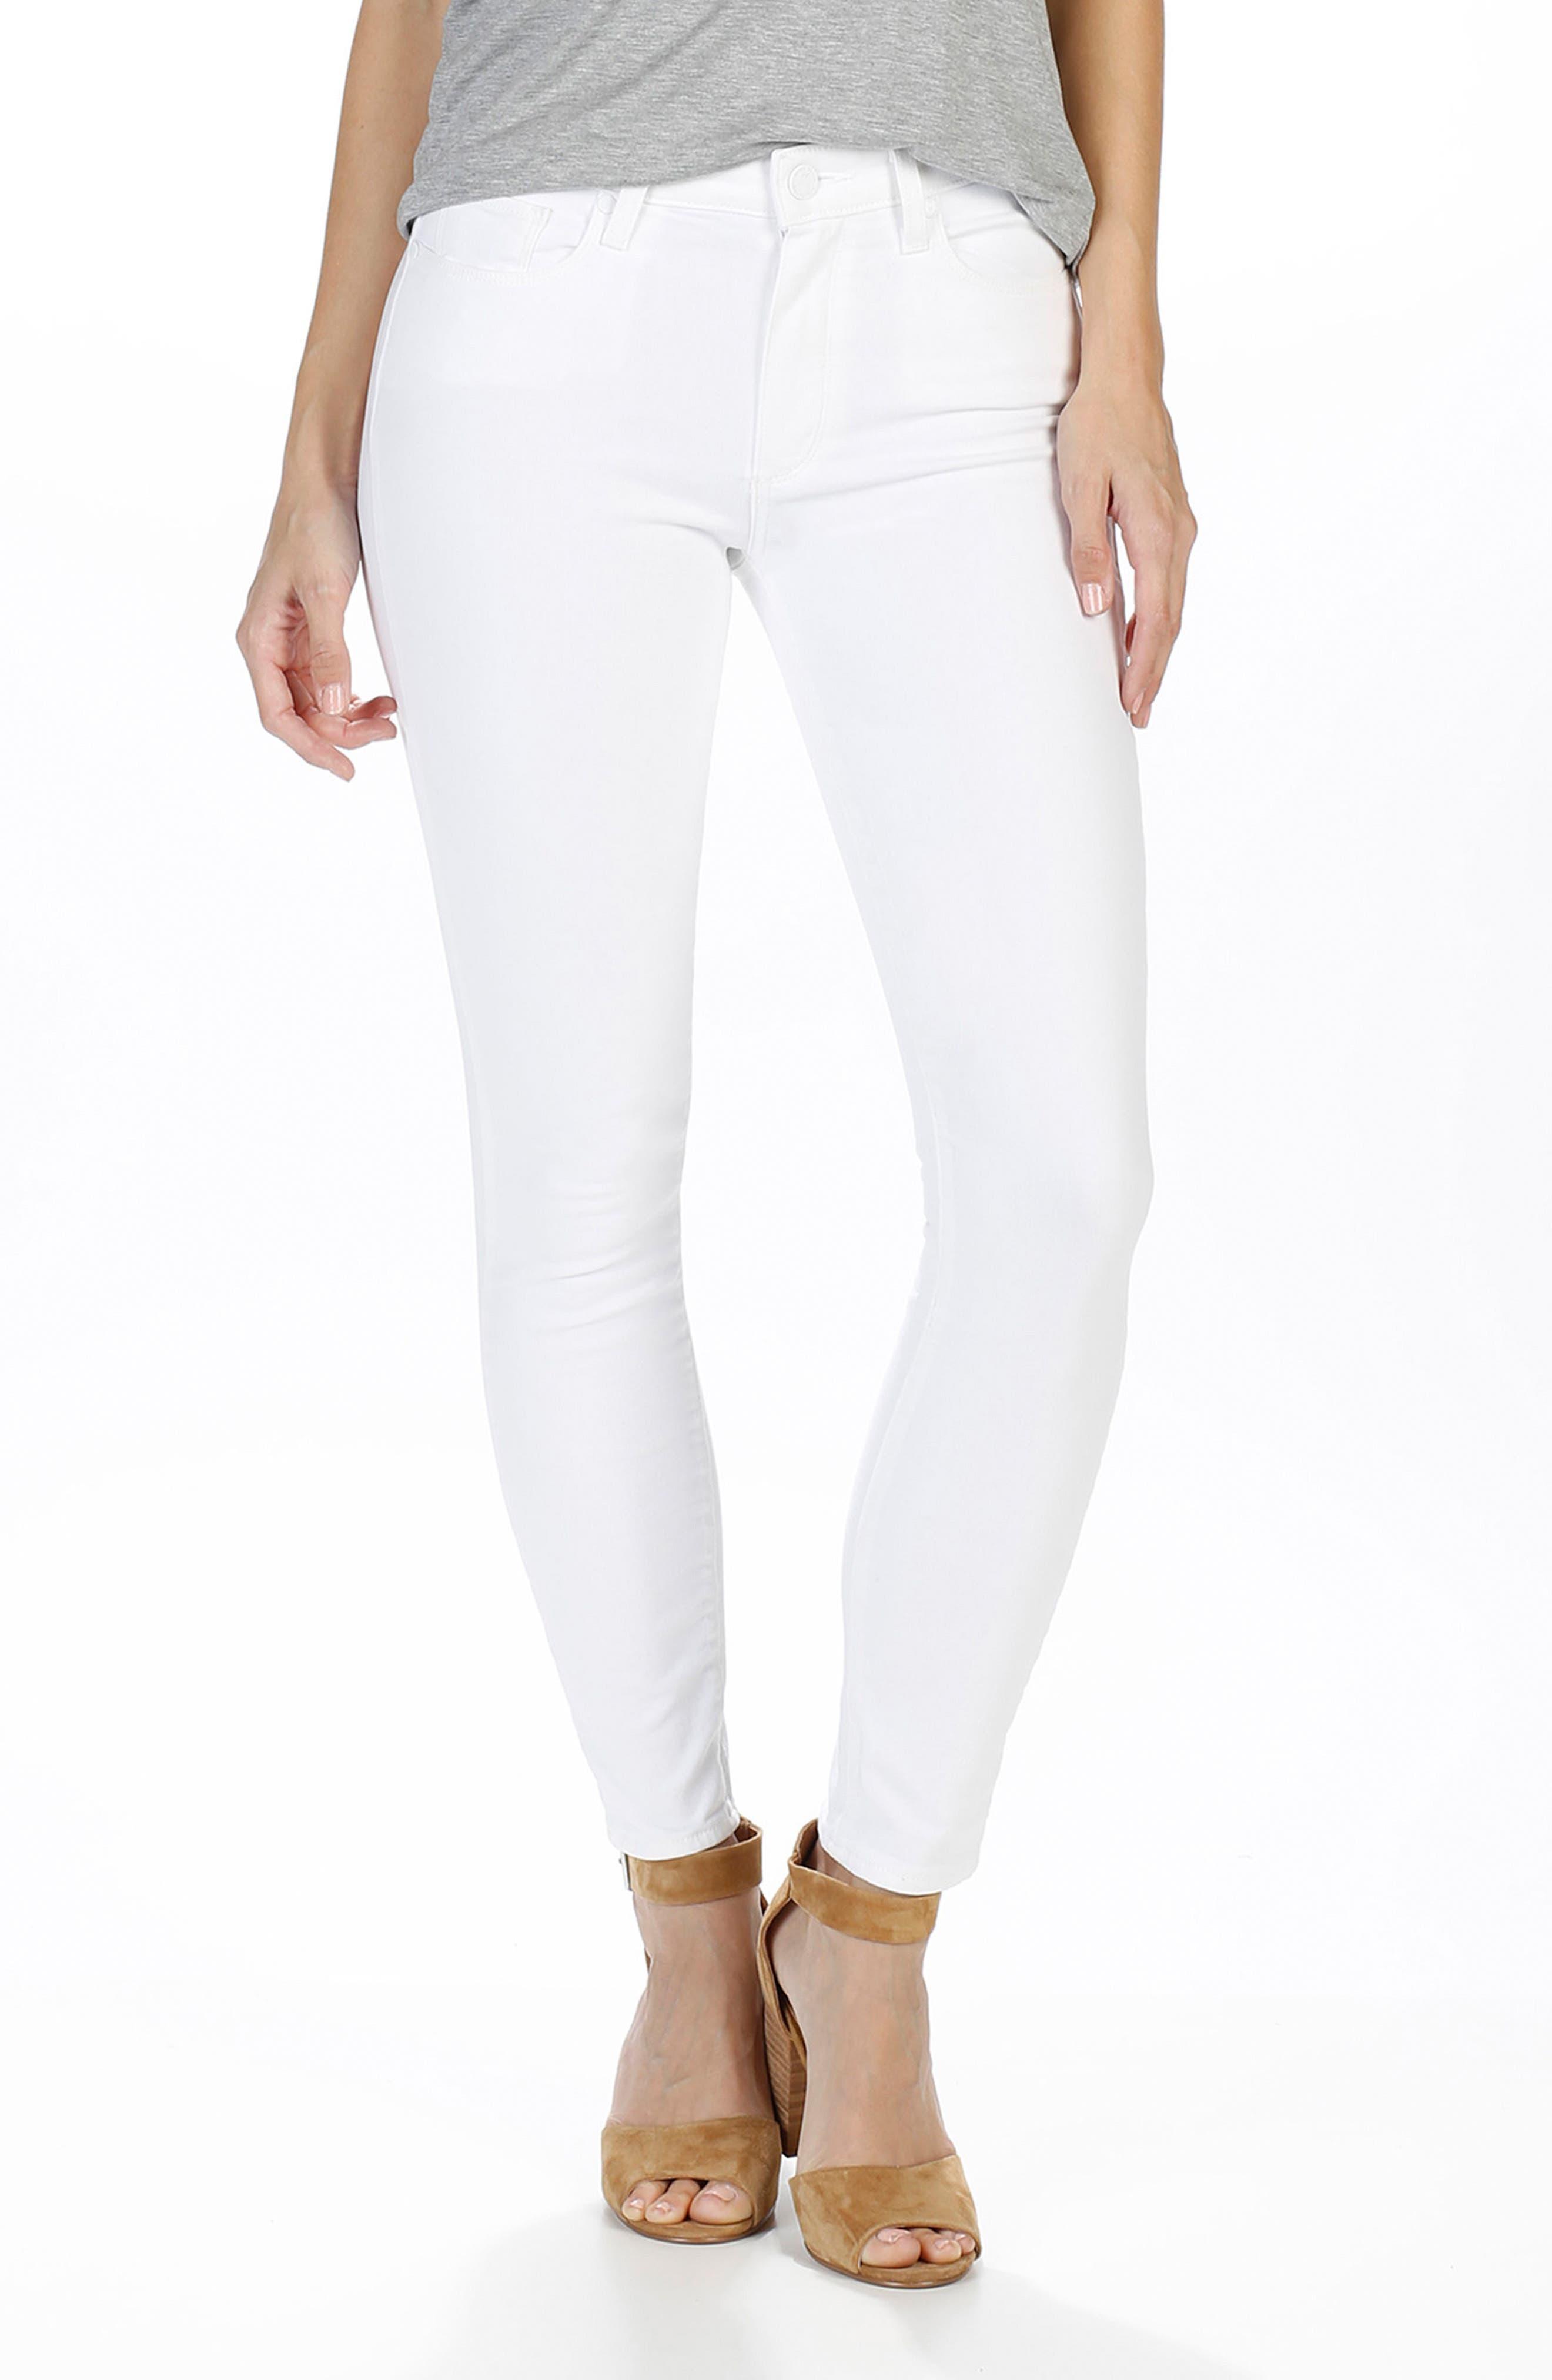 Hoxton High Waist Ankle Skinny Jeans,                             Alternate thumbnail 2, color,                             Optic White